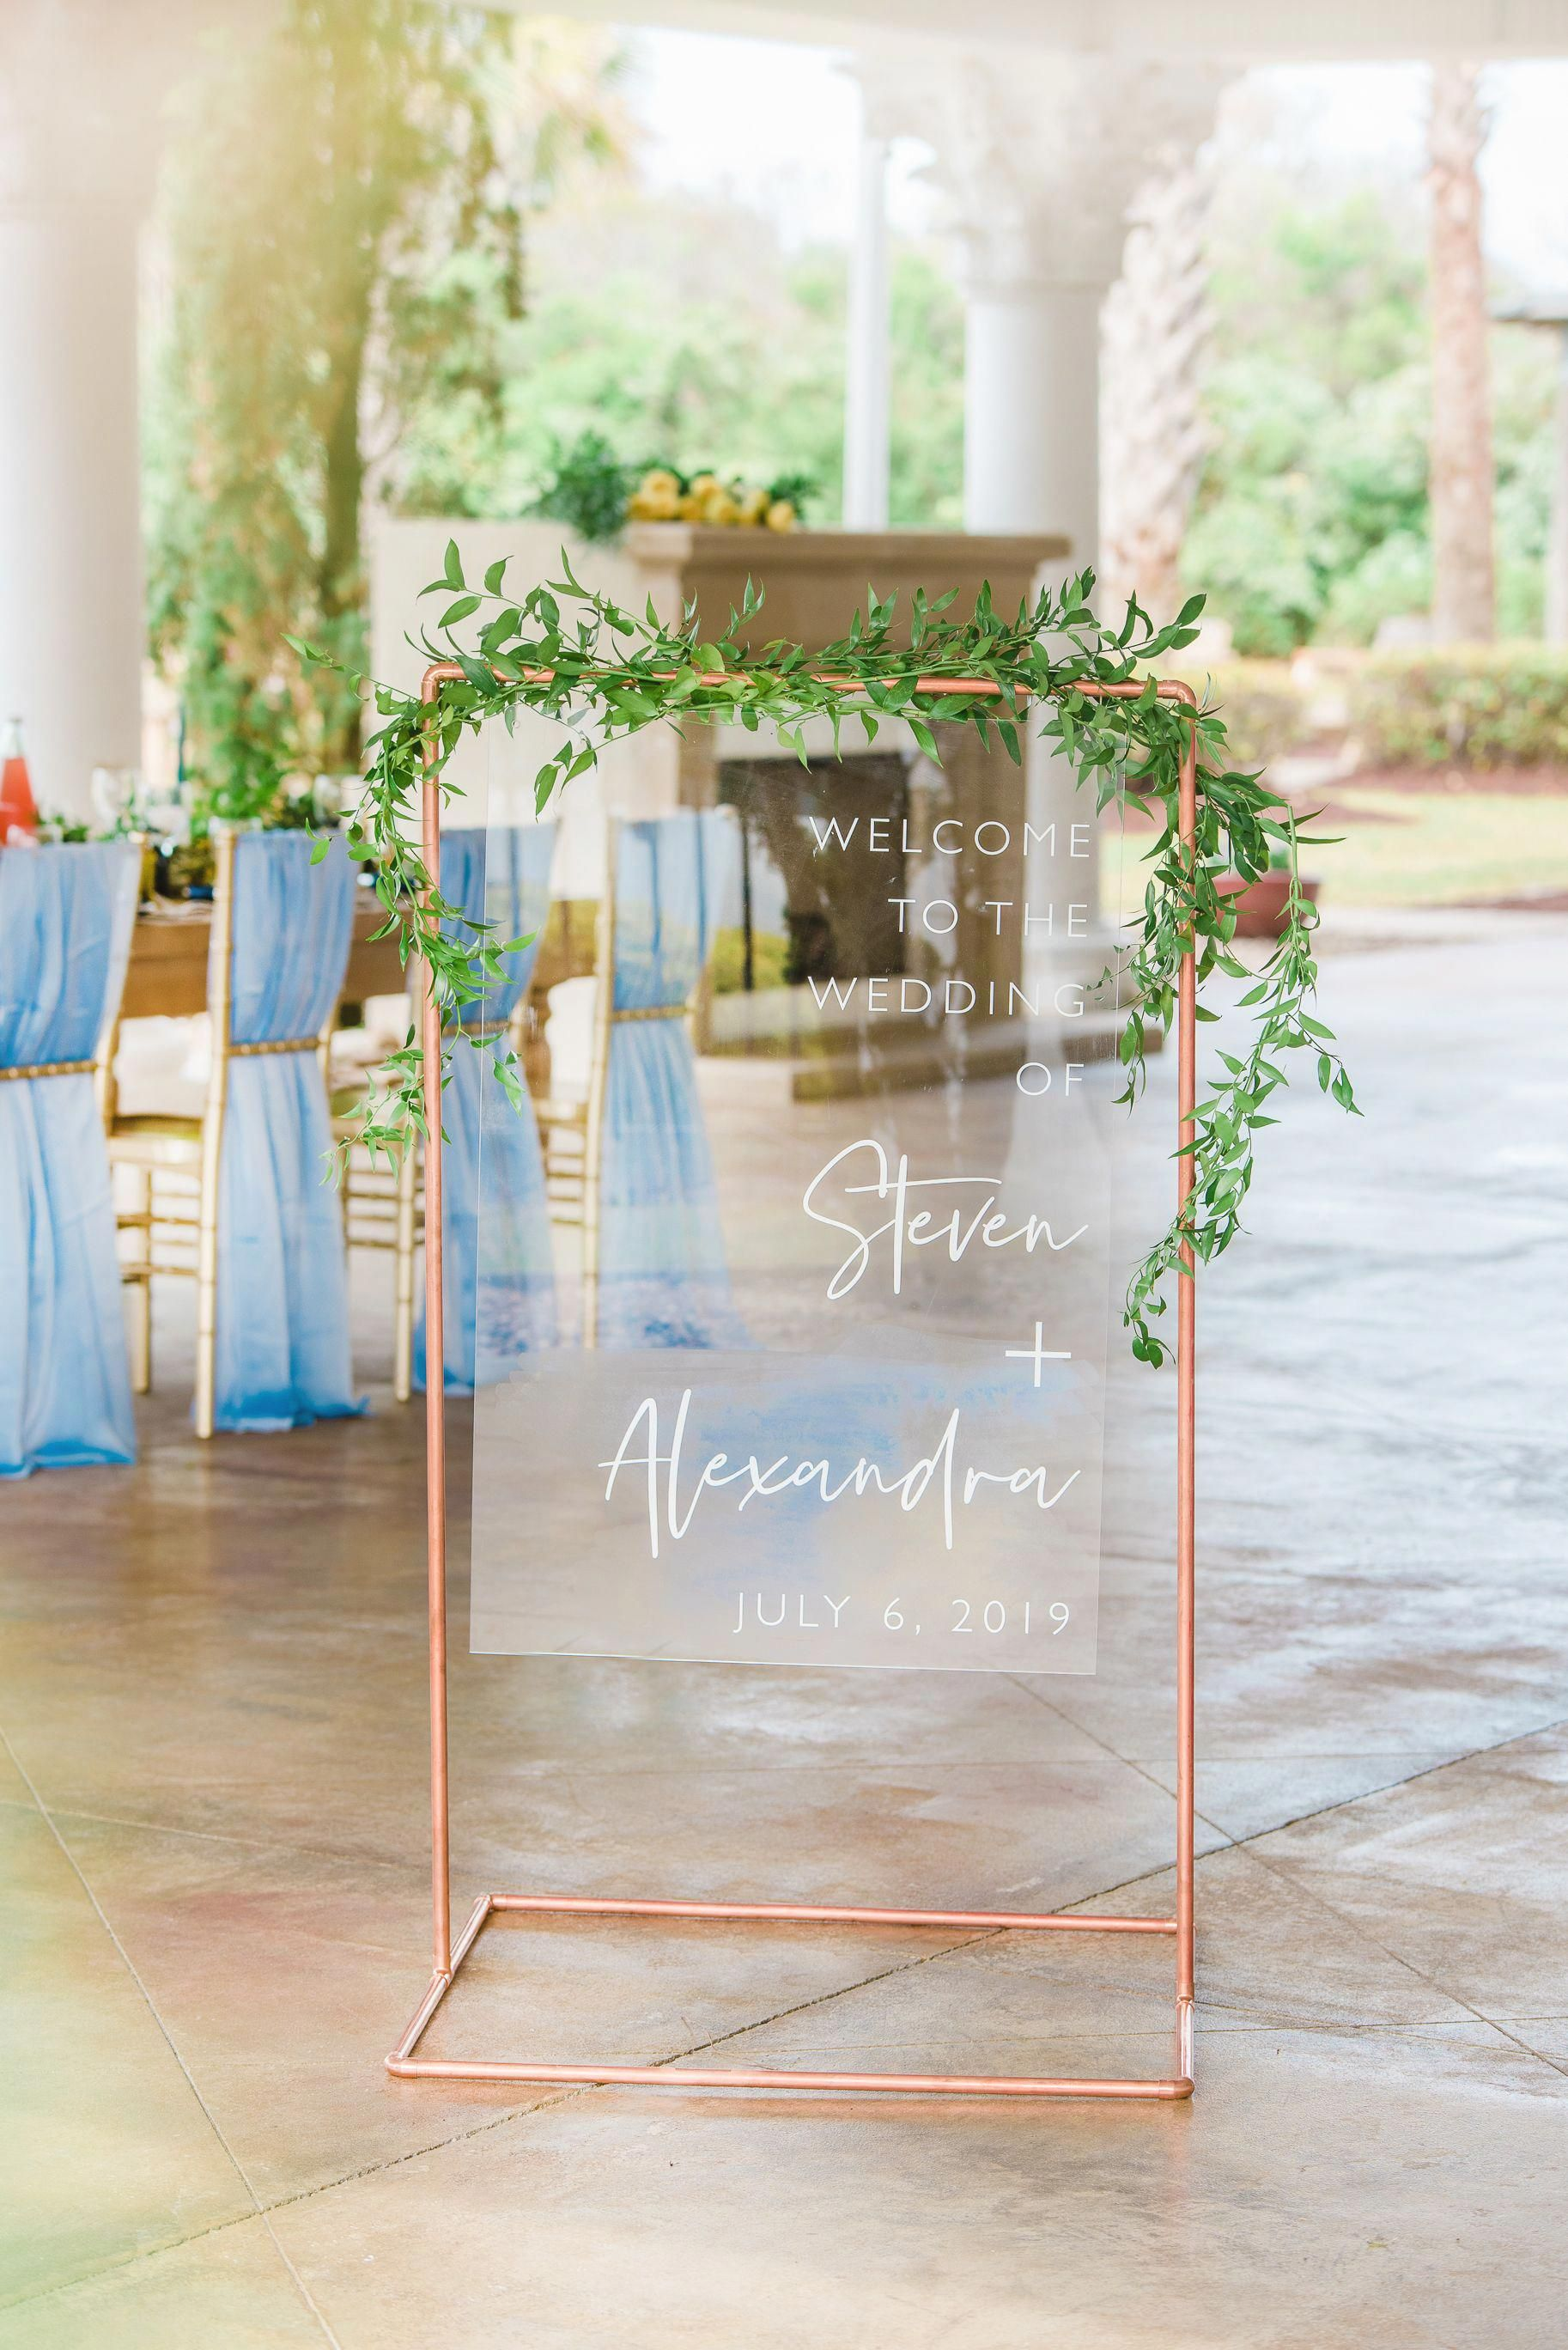 Pin on wedding decorations ideas